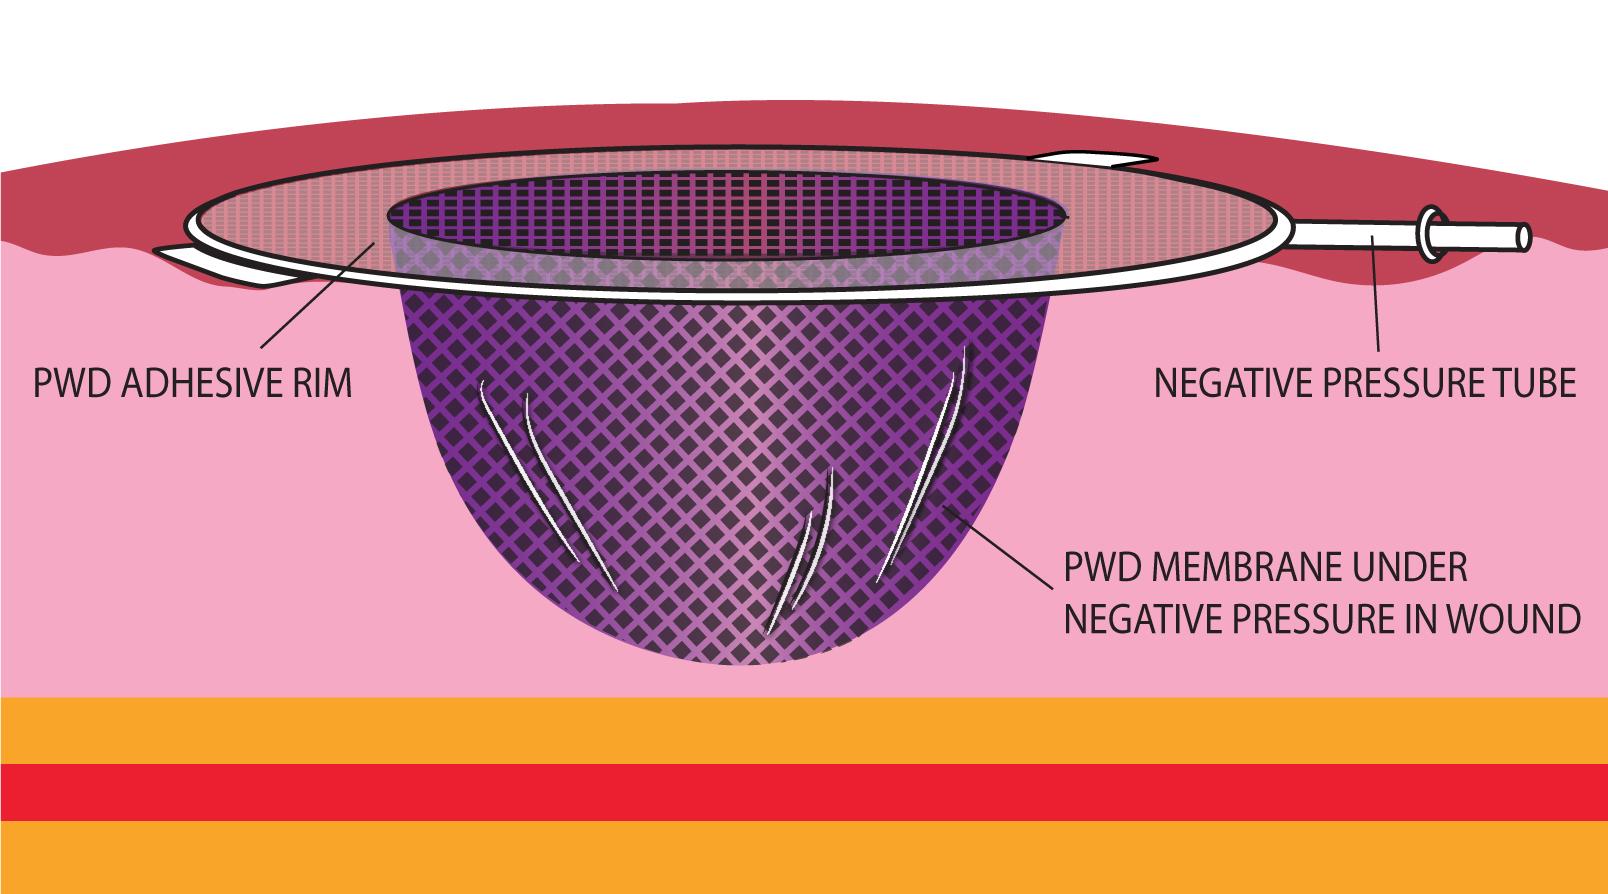 Advancing Negative Pressure Wound Therapy